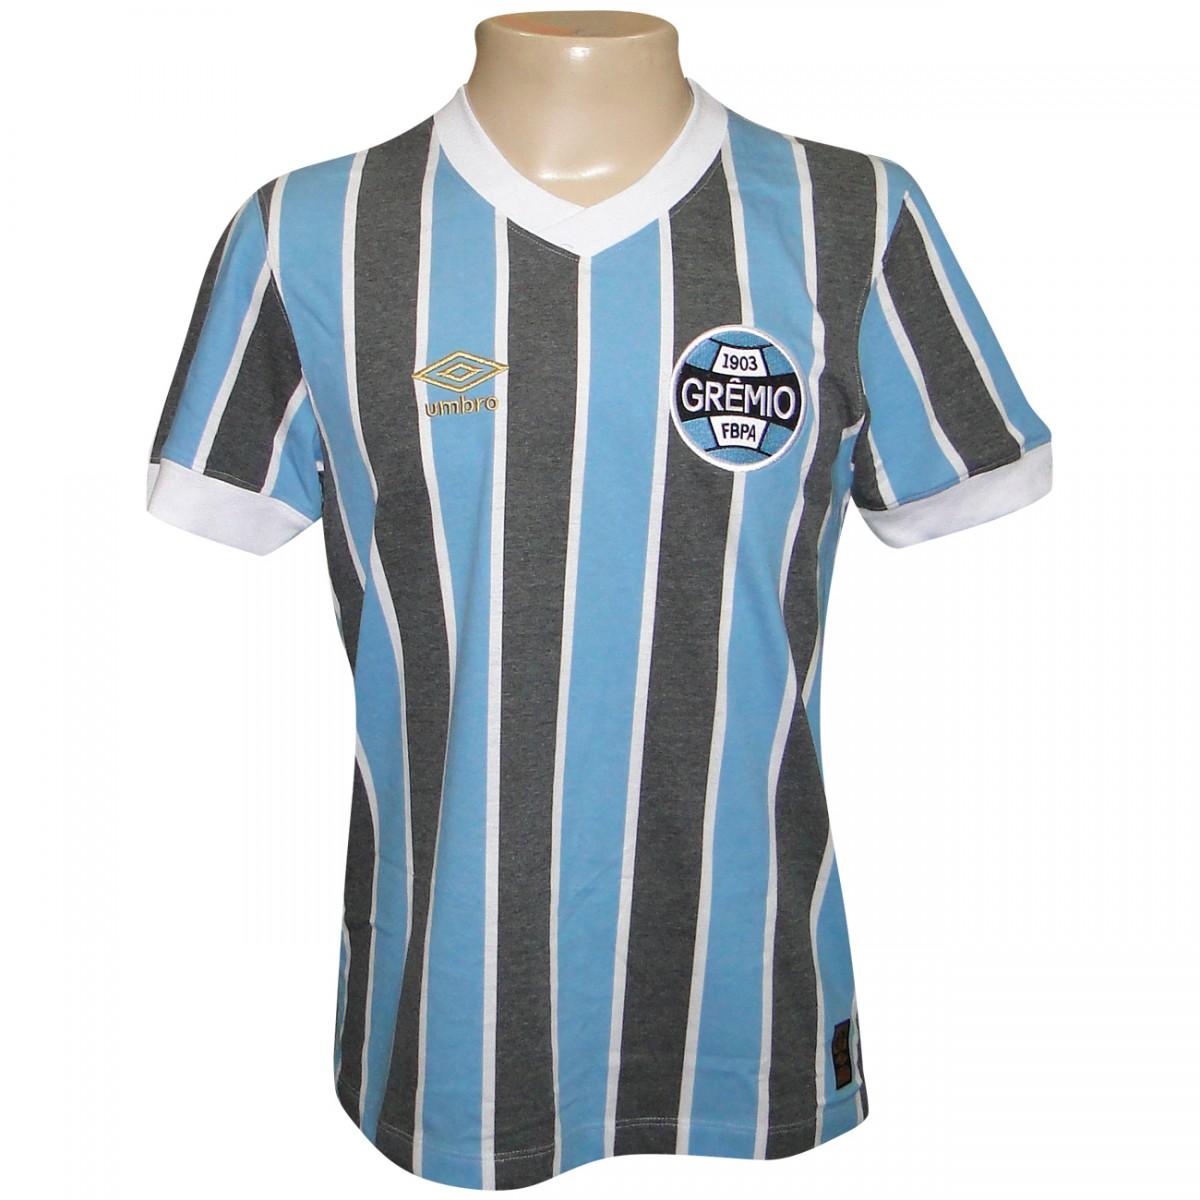 6f7ad21c95f01 Camisa Gremio Umbro Retro 1983 606362 - Tricolor - Chuteira Nike ...